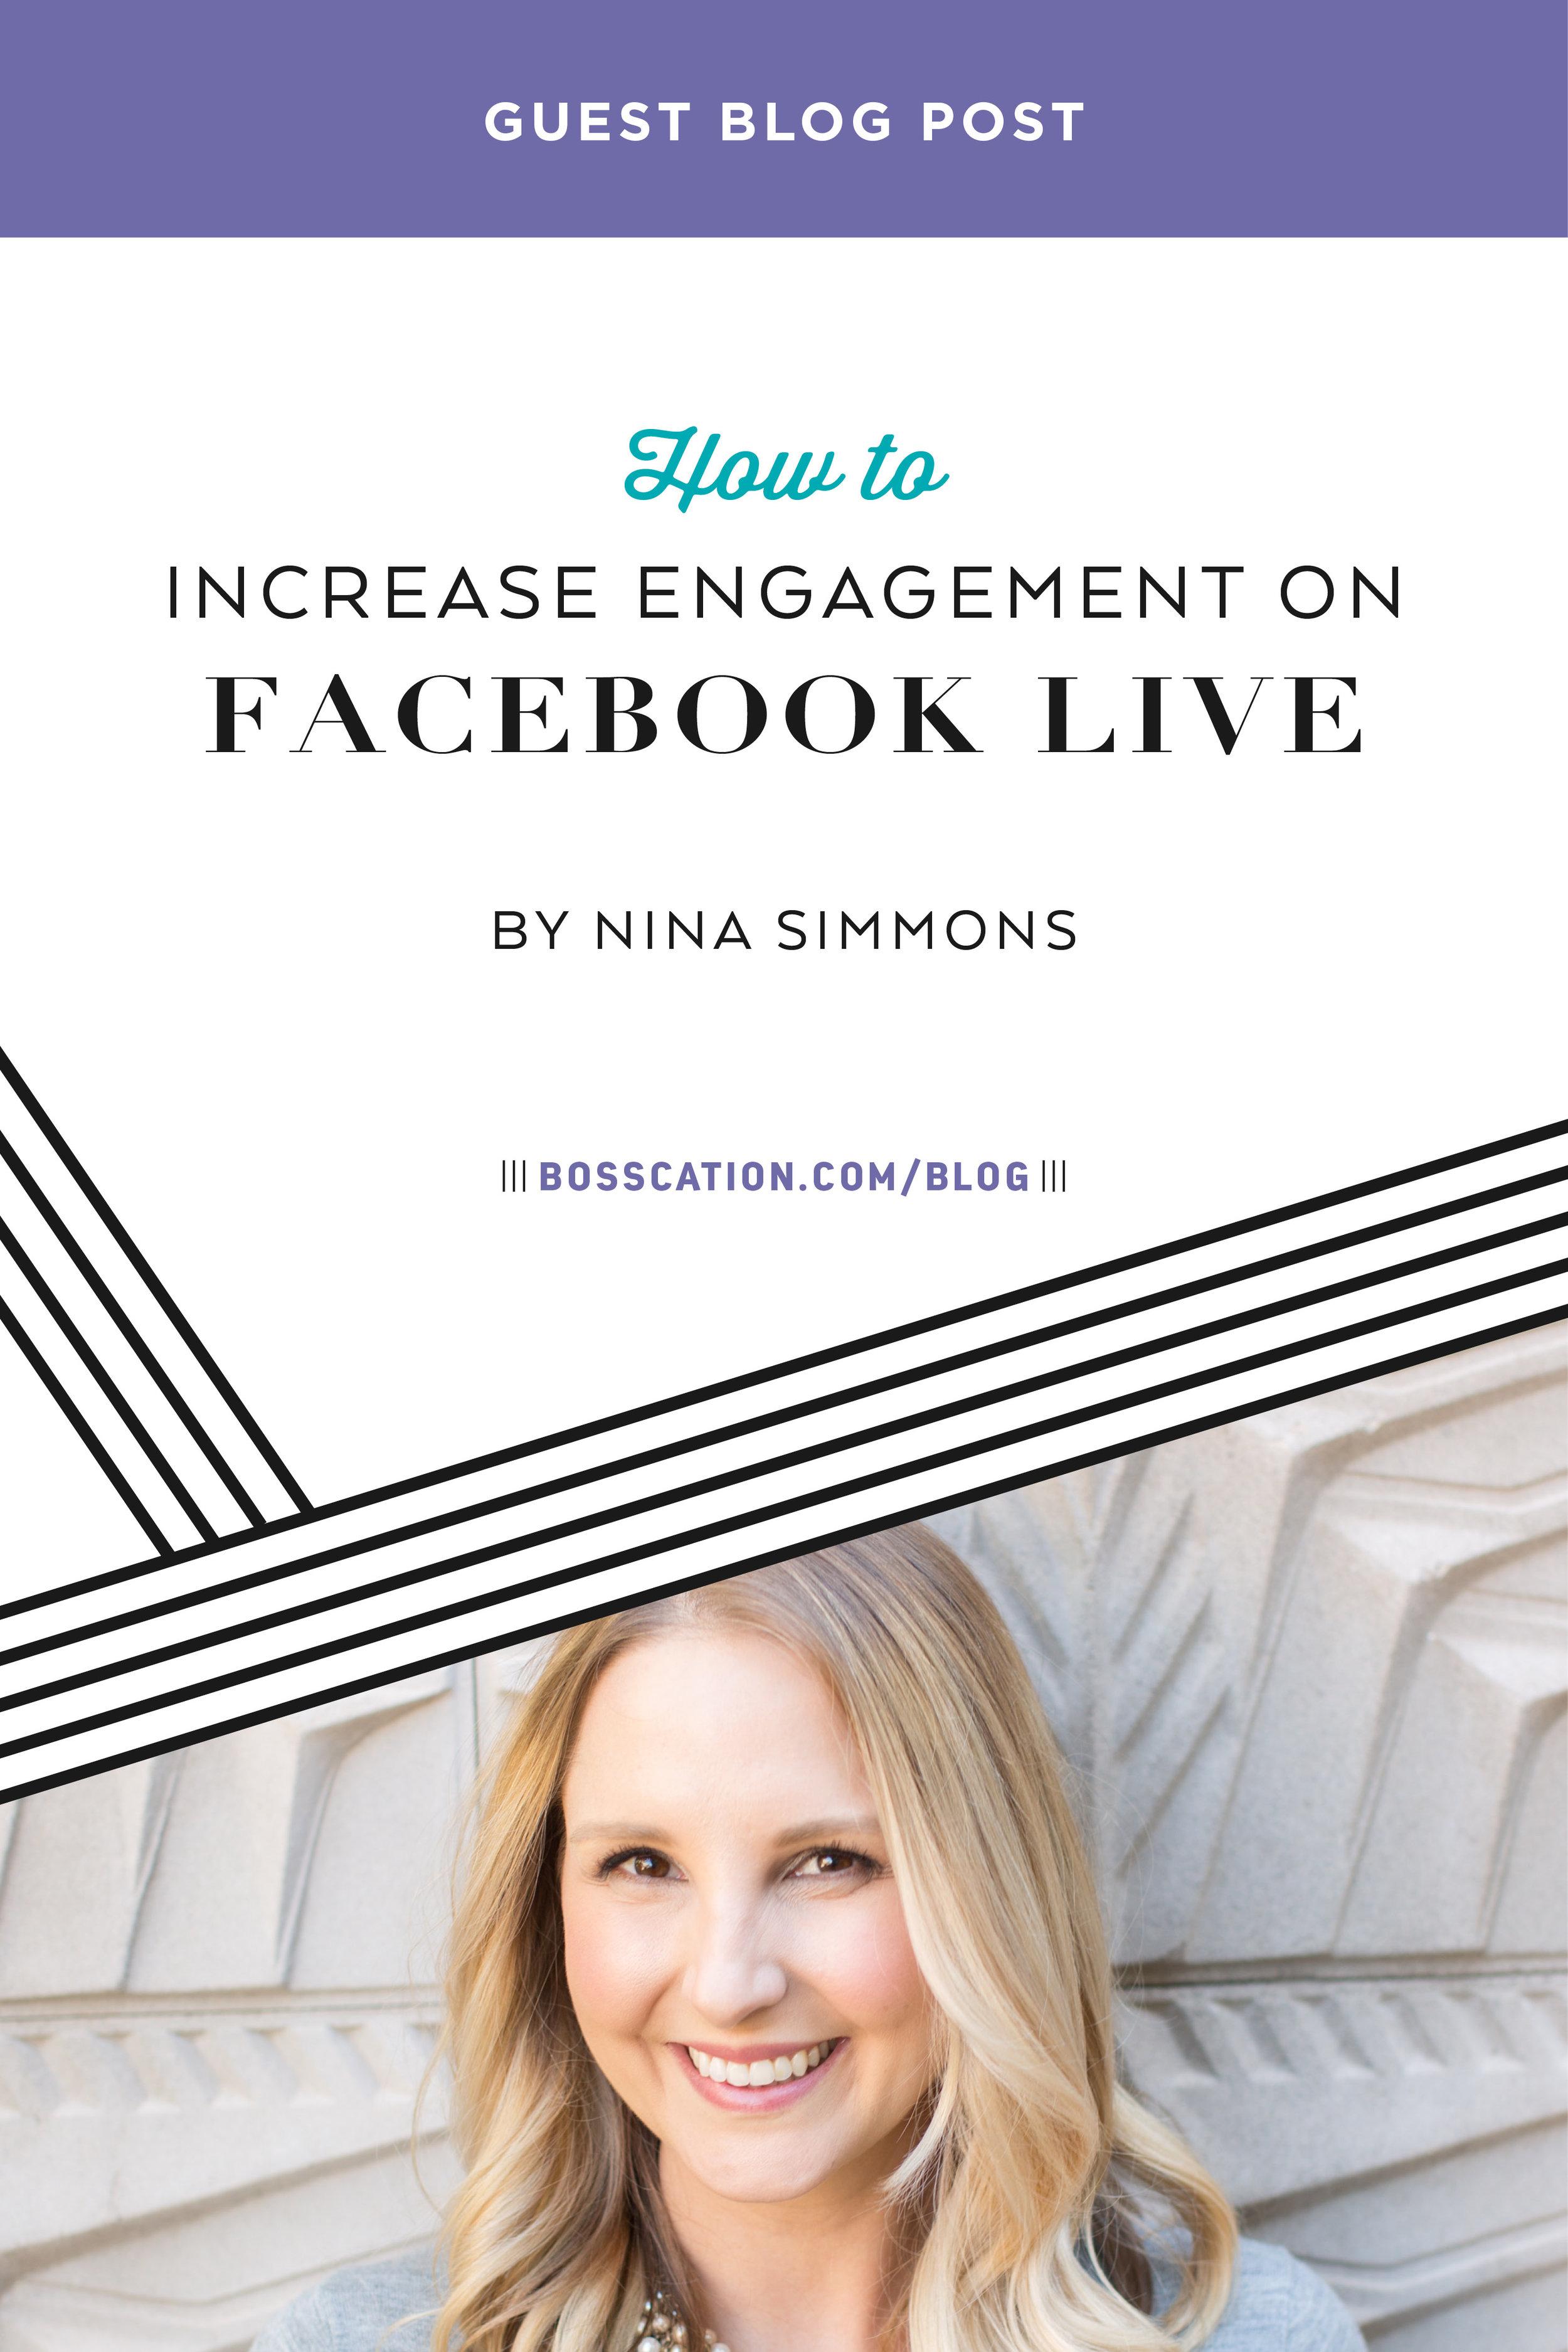 Increase-engagement-on-facebook-live-Pinterest.jpg